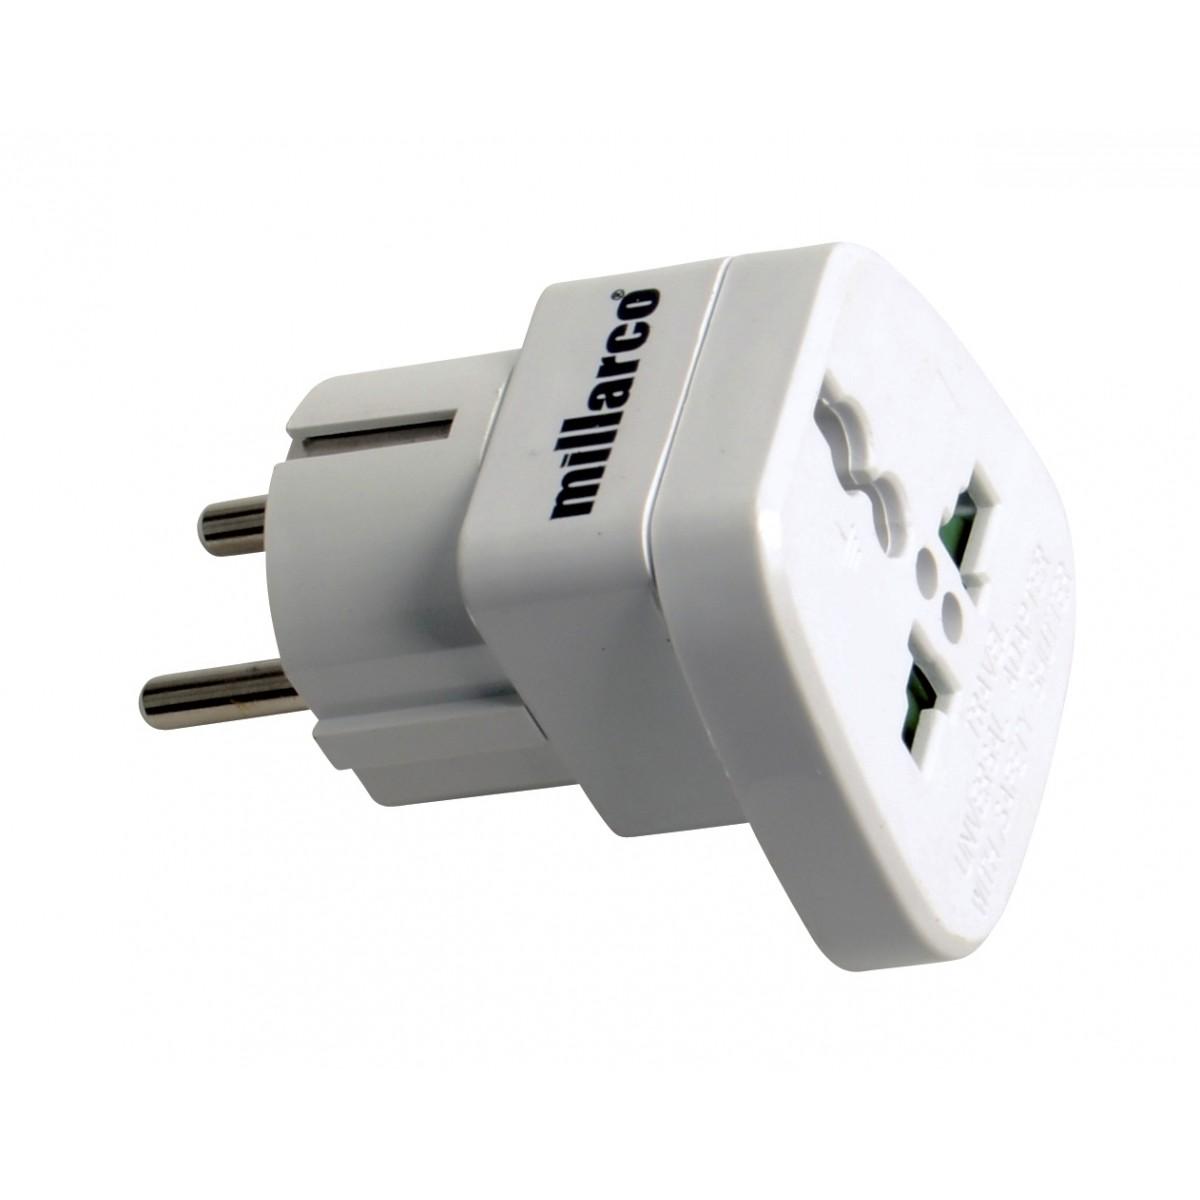 MILLARCO Universal adapter t/brug i DK